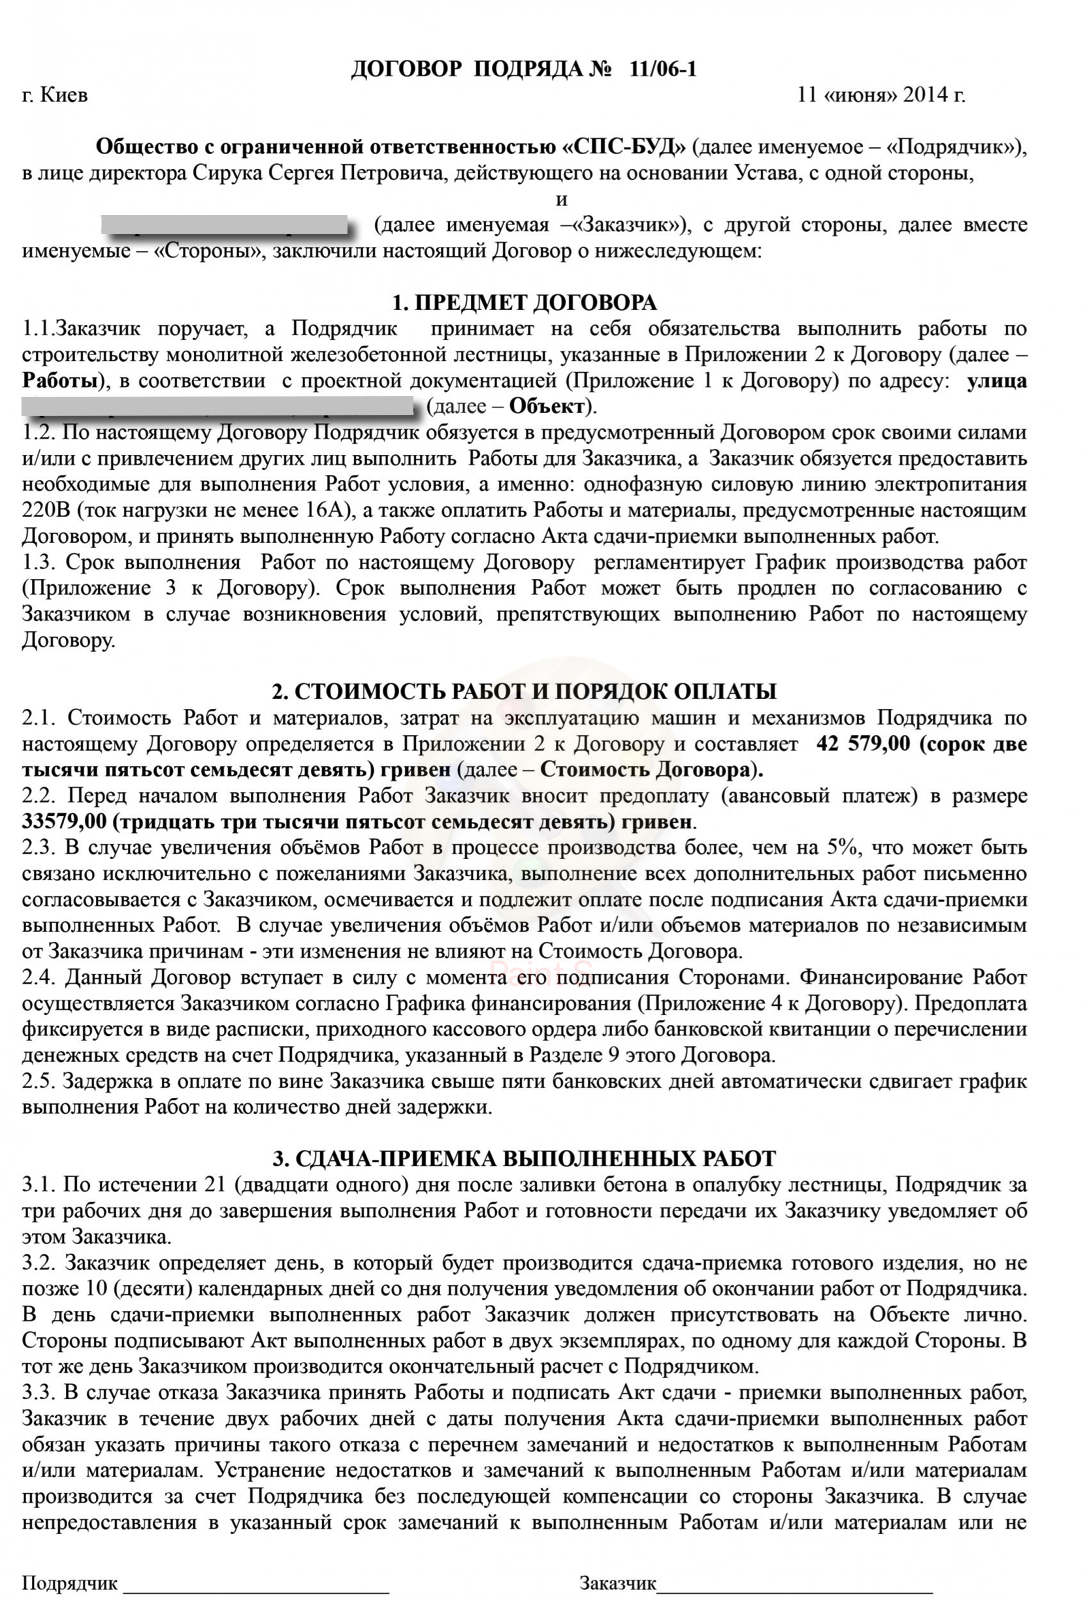 Образец договора страница 1